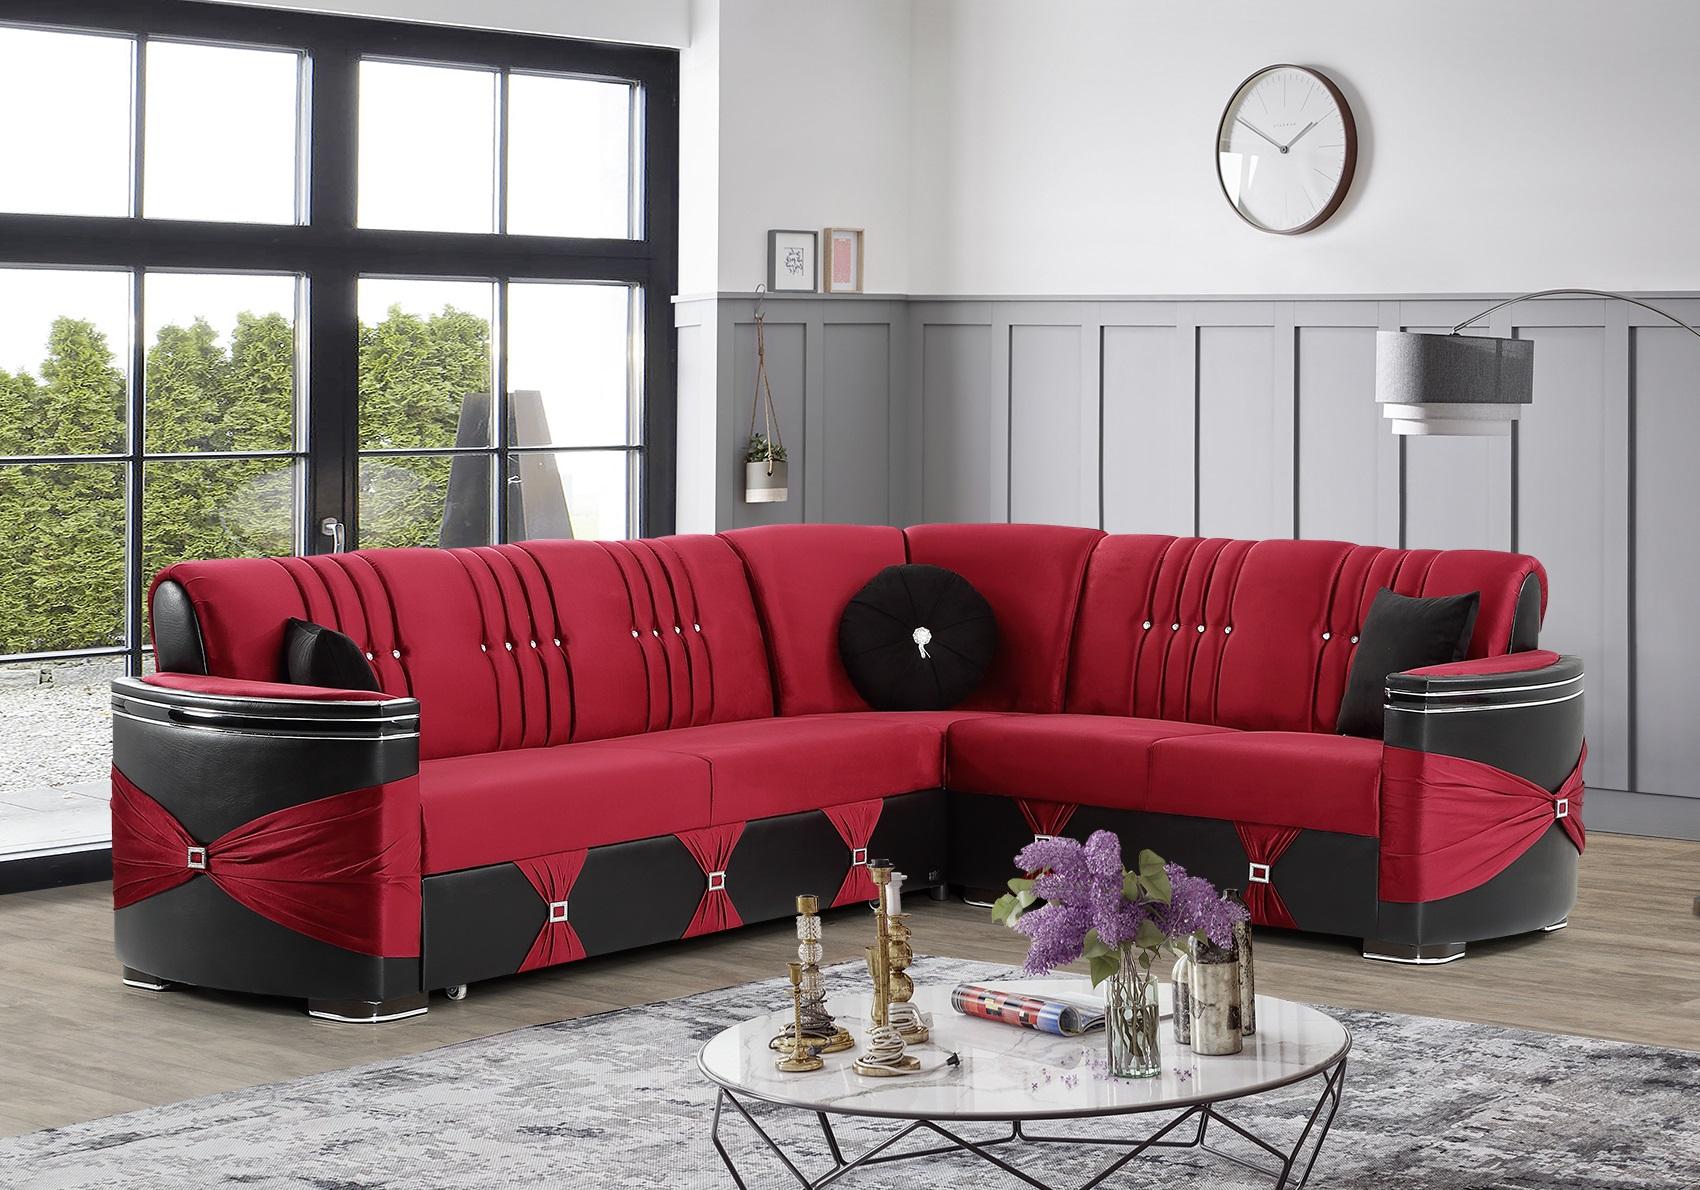 Canapé angle convertible-lit rouge PALACE